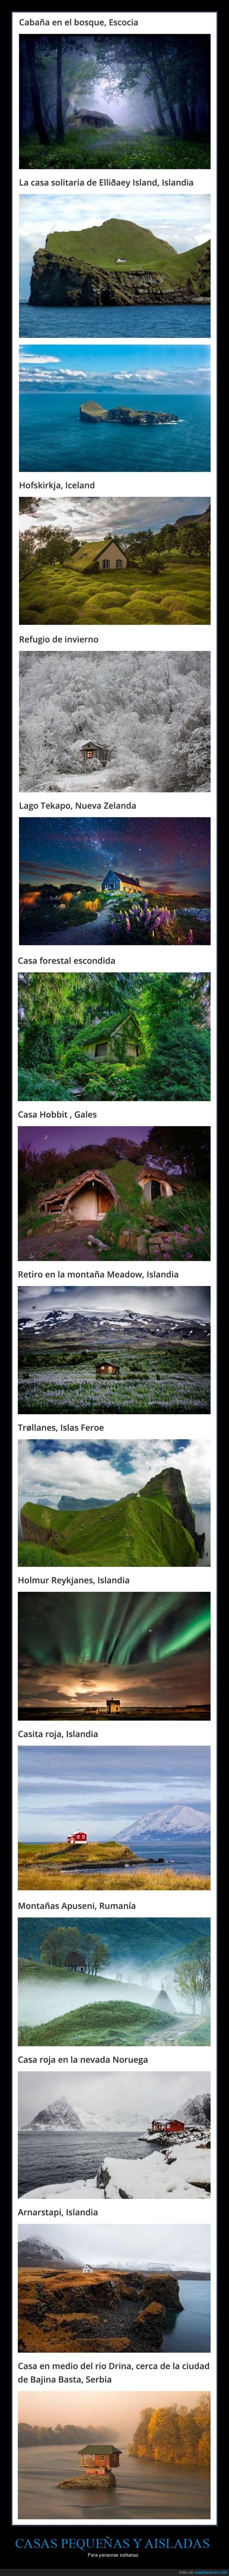 aisladas,casas,pequeñas